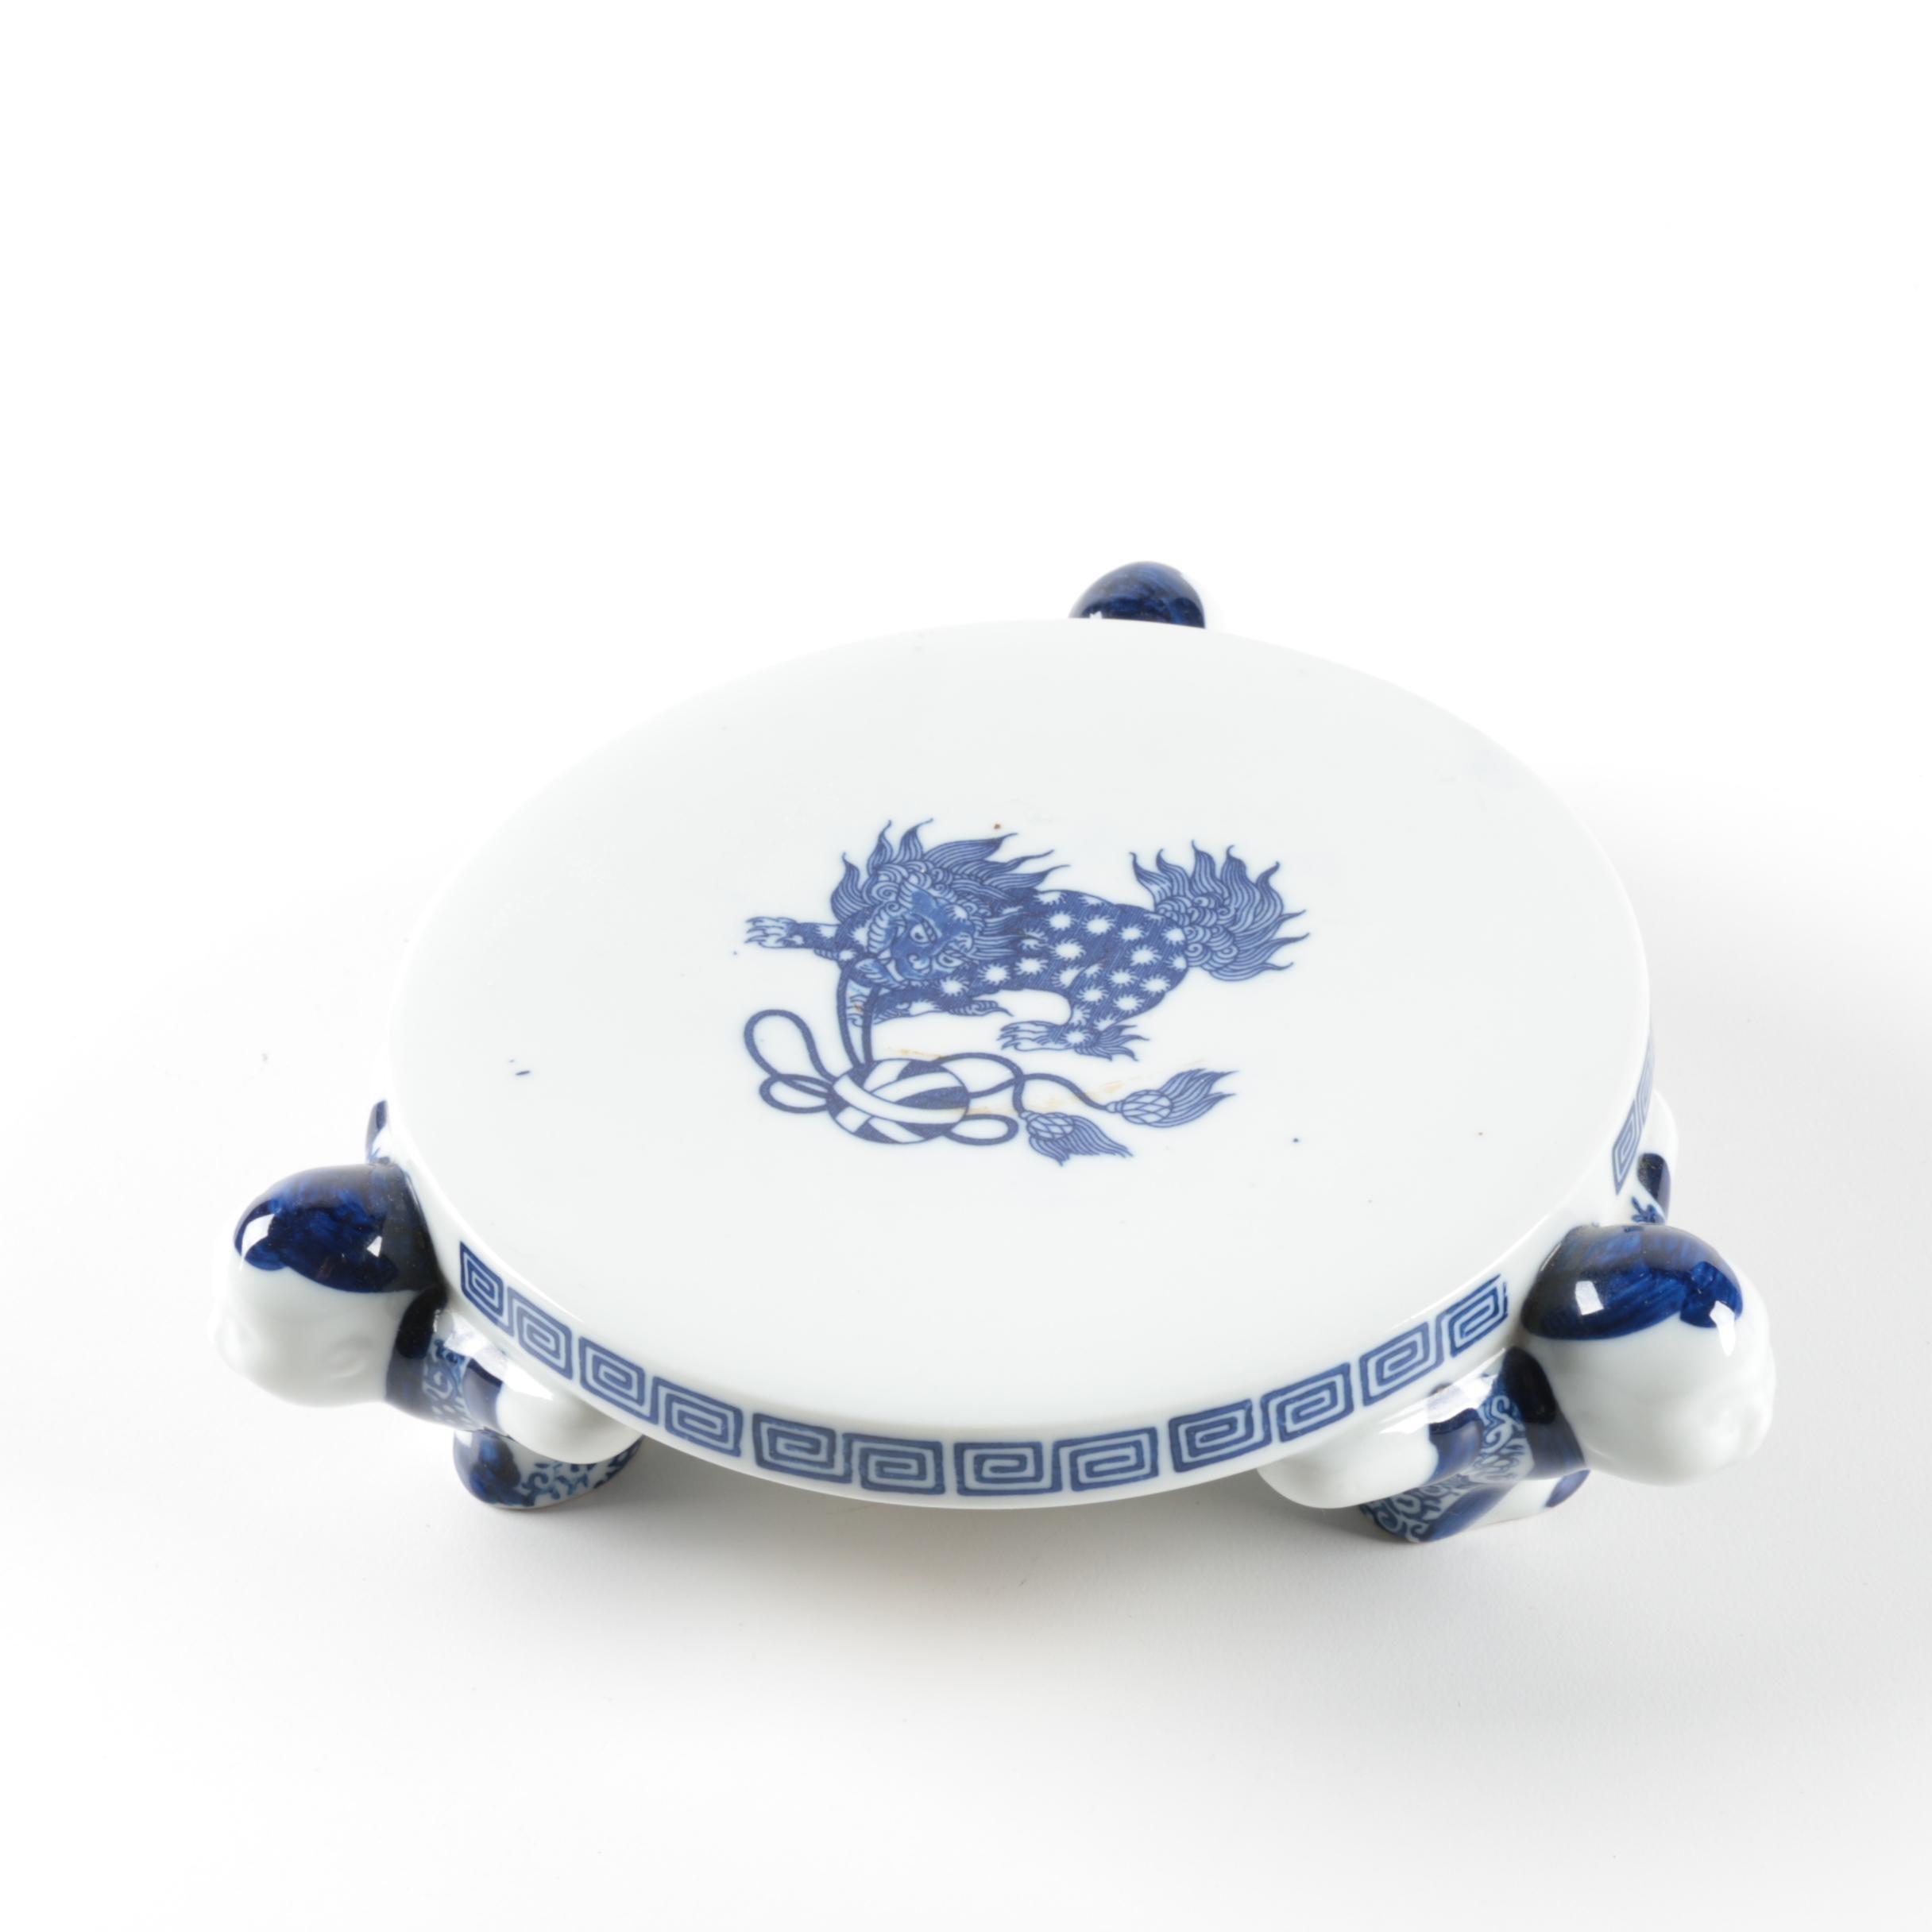 Takahashi Figural Ceramic Stand